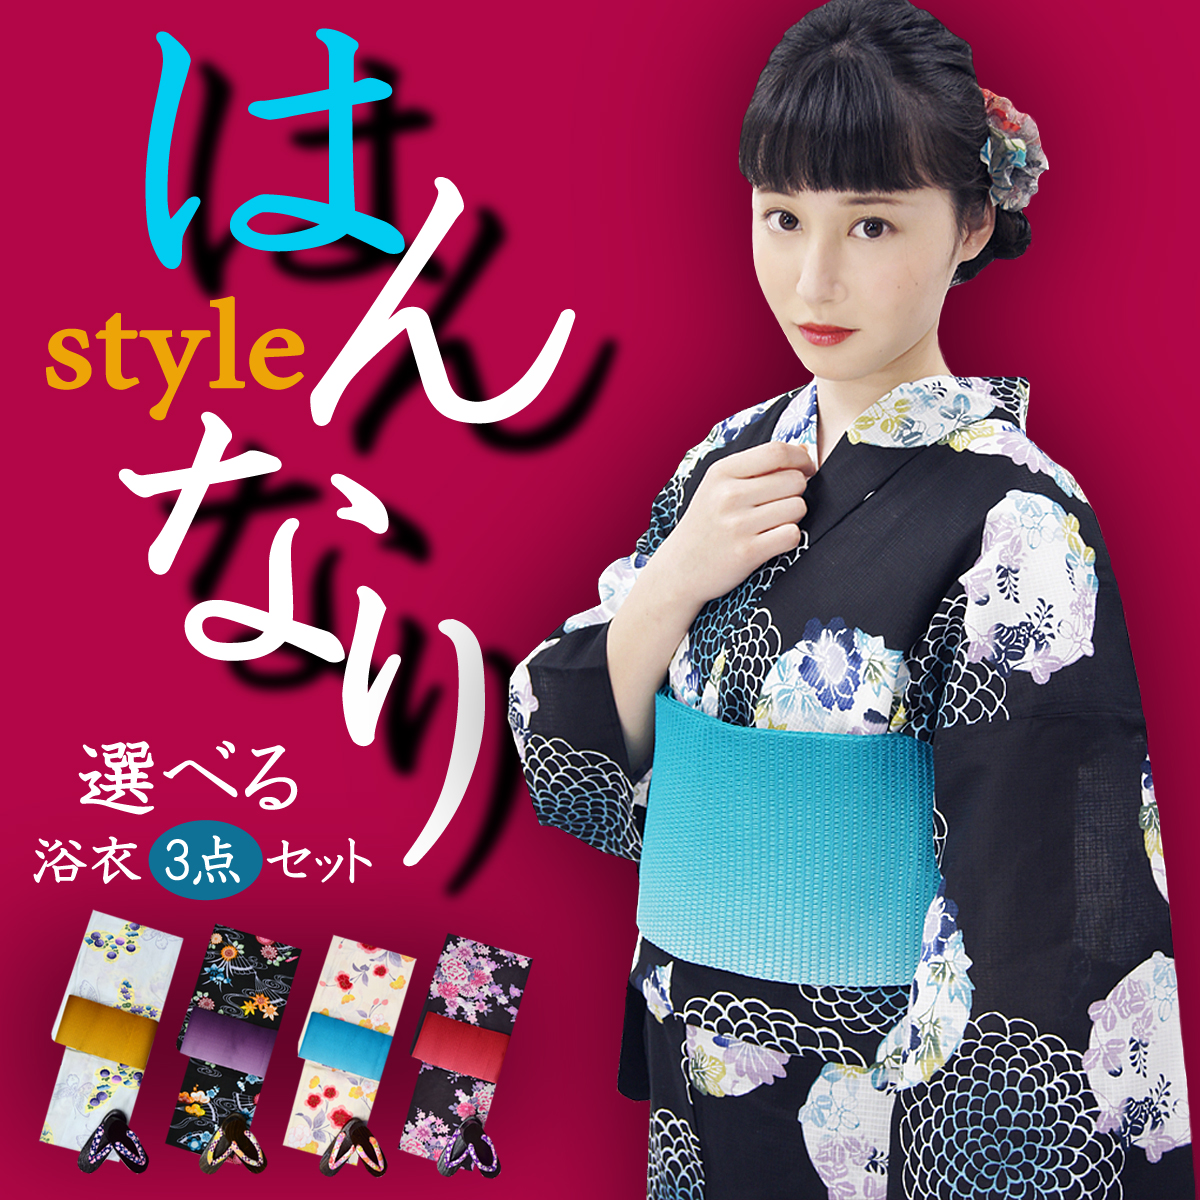 Yukata + belt + shoe bags!